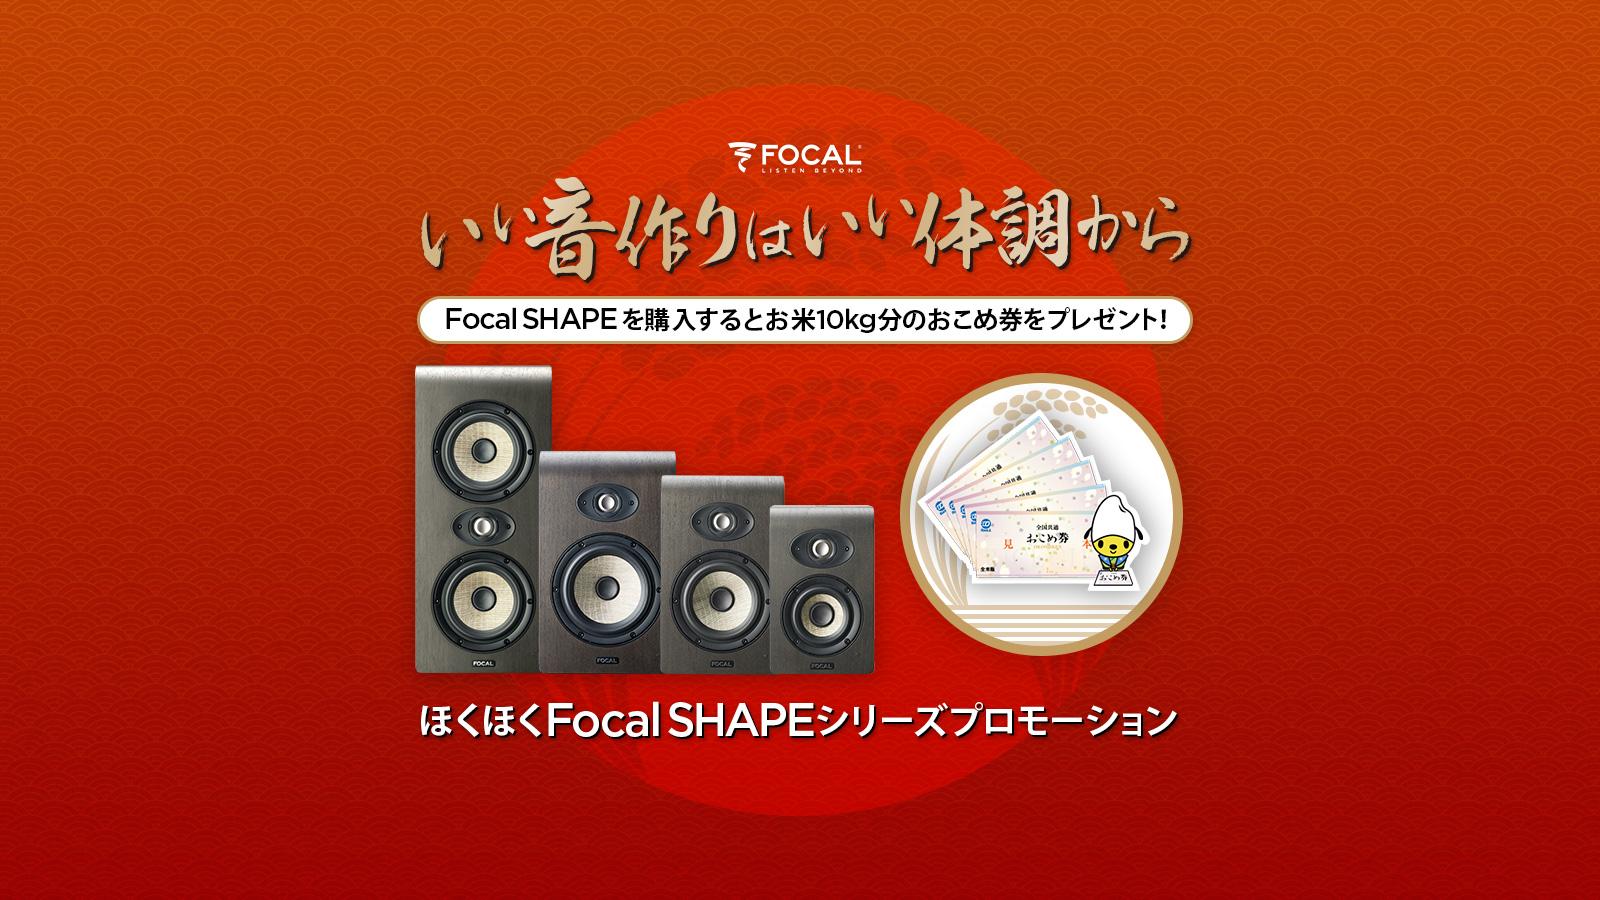 FOCAL PROFESSIONAL SHAPE 40(ペア)【ペア購入対象:10kg分のおこめ券プレゼント】